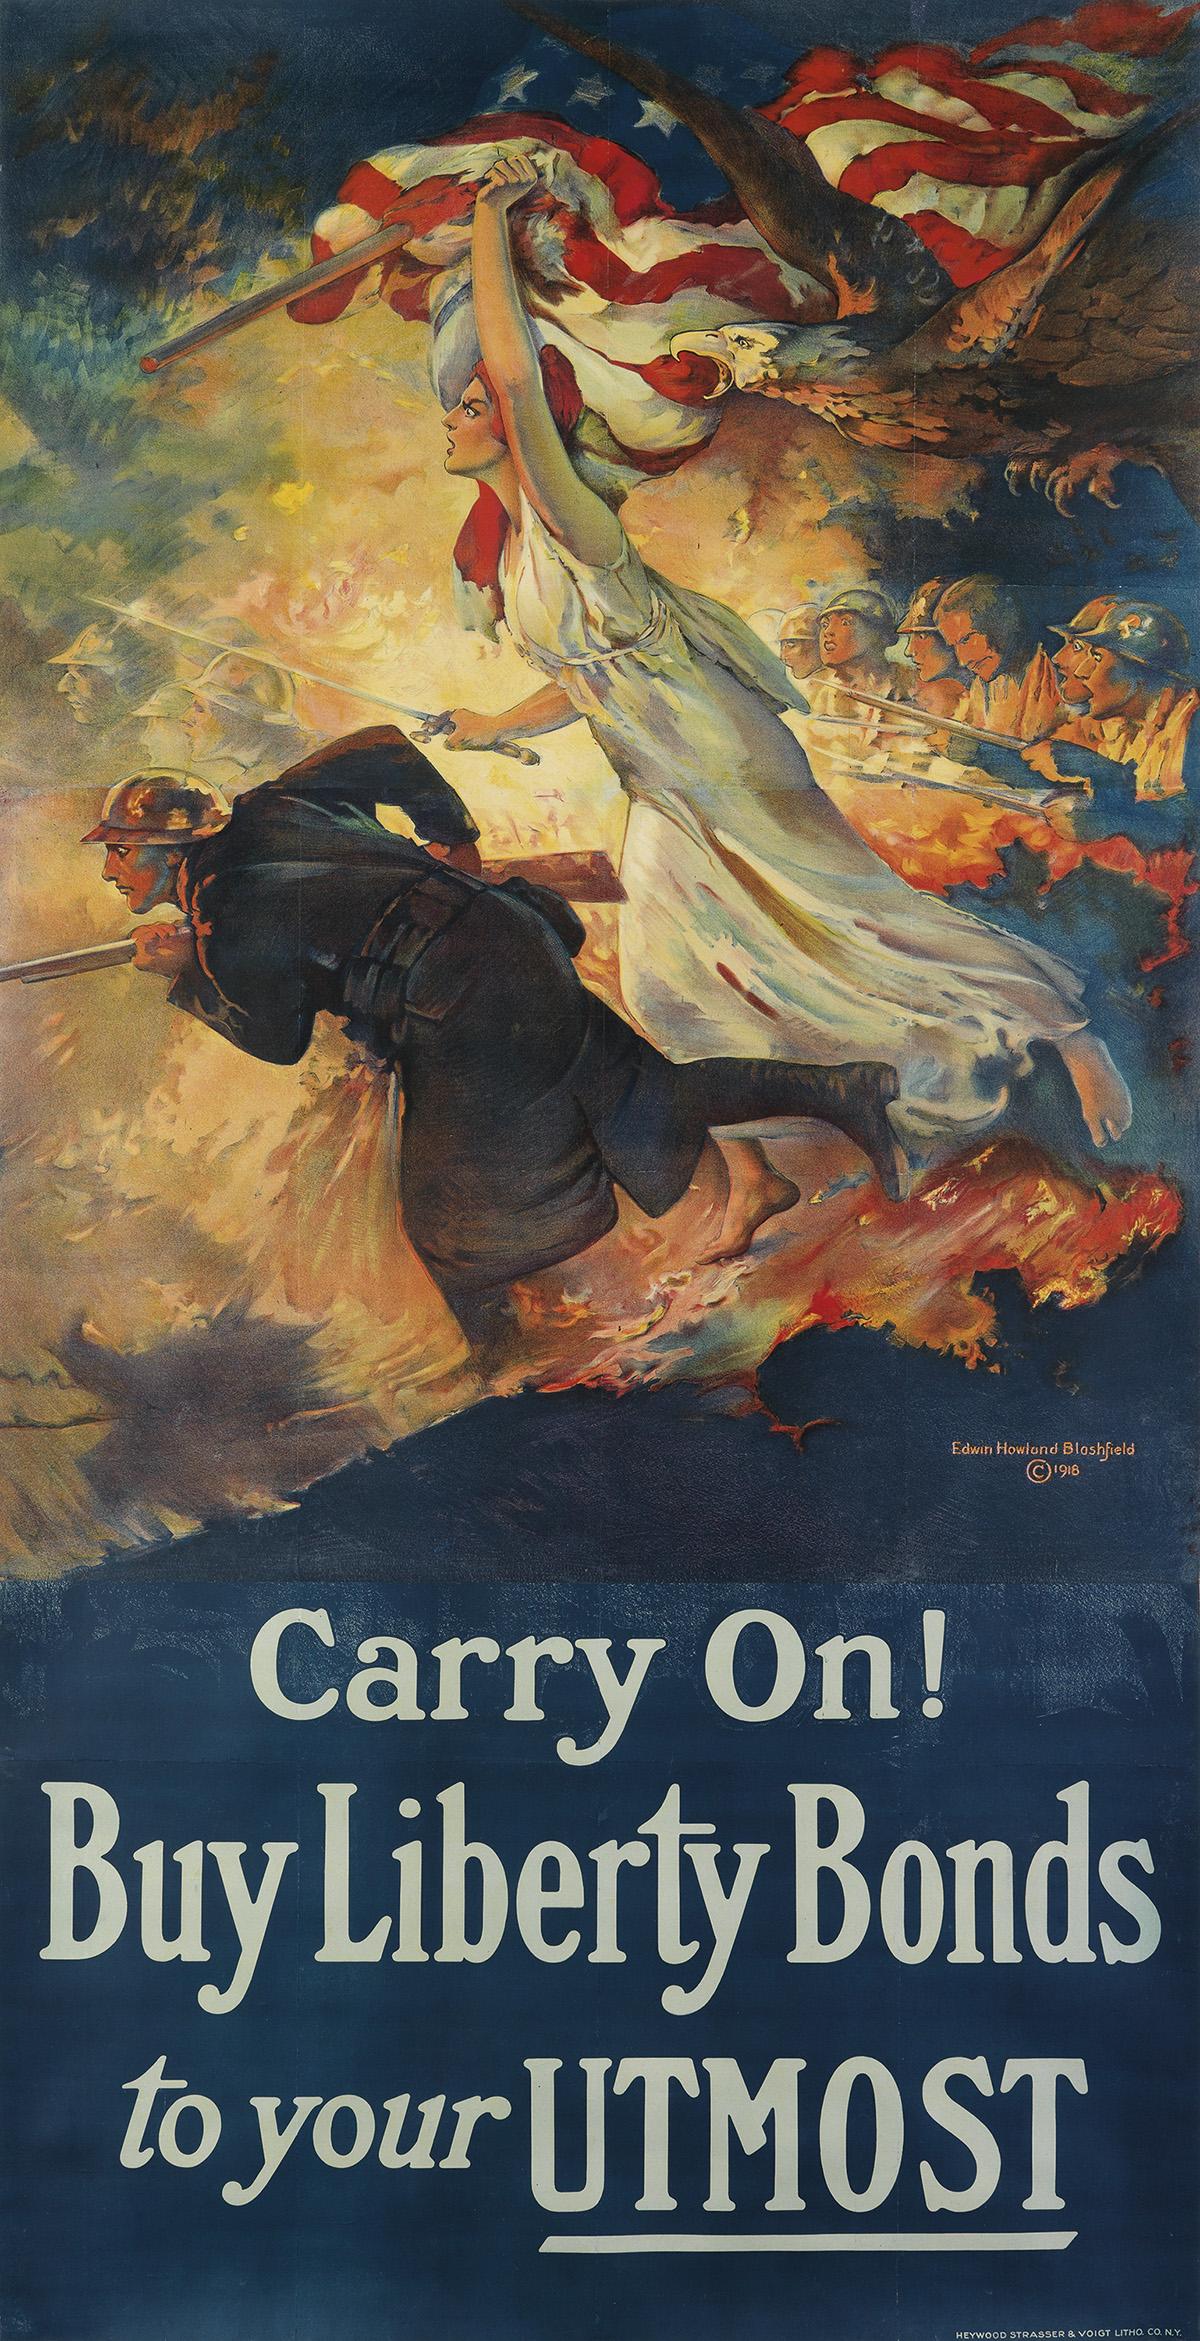 EDWIN-HOWLAND-BLASHFIELD-(1848-1936)-CARRY-ON--BUY-LIBERTY-B